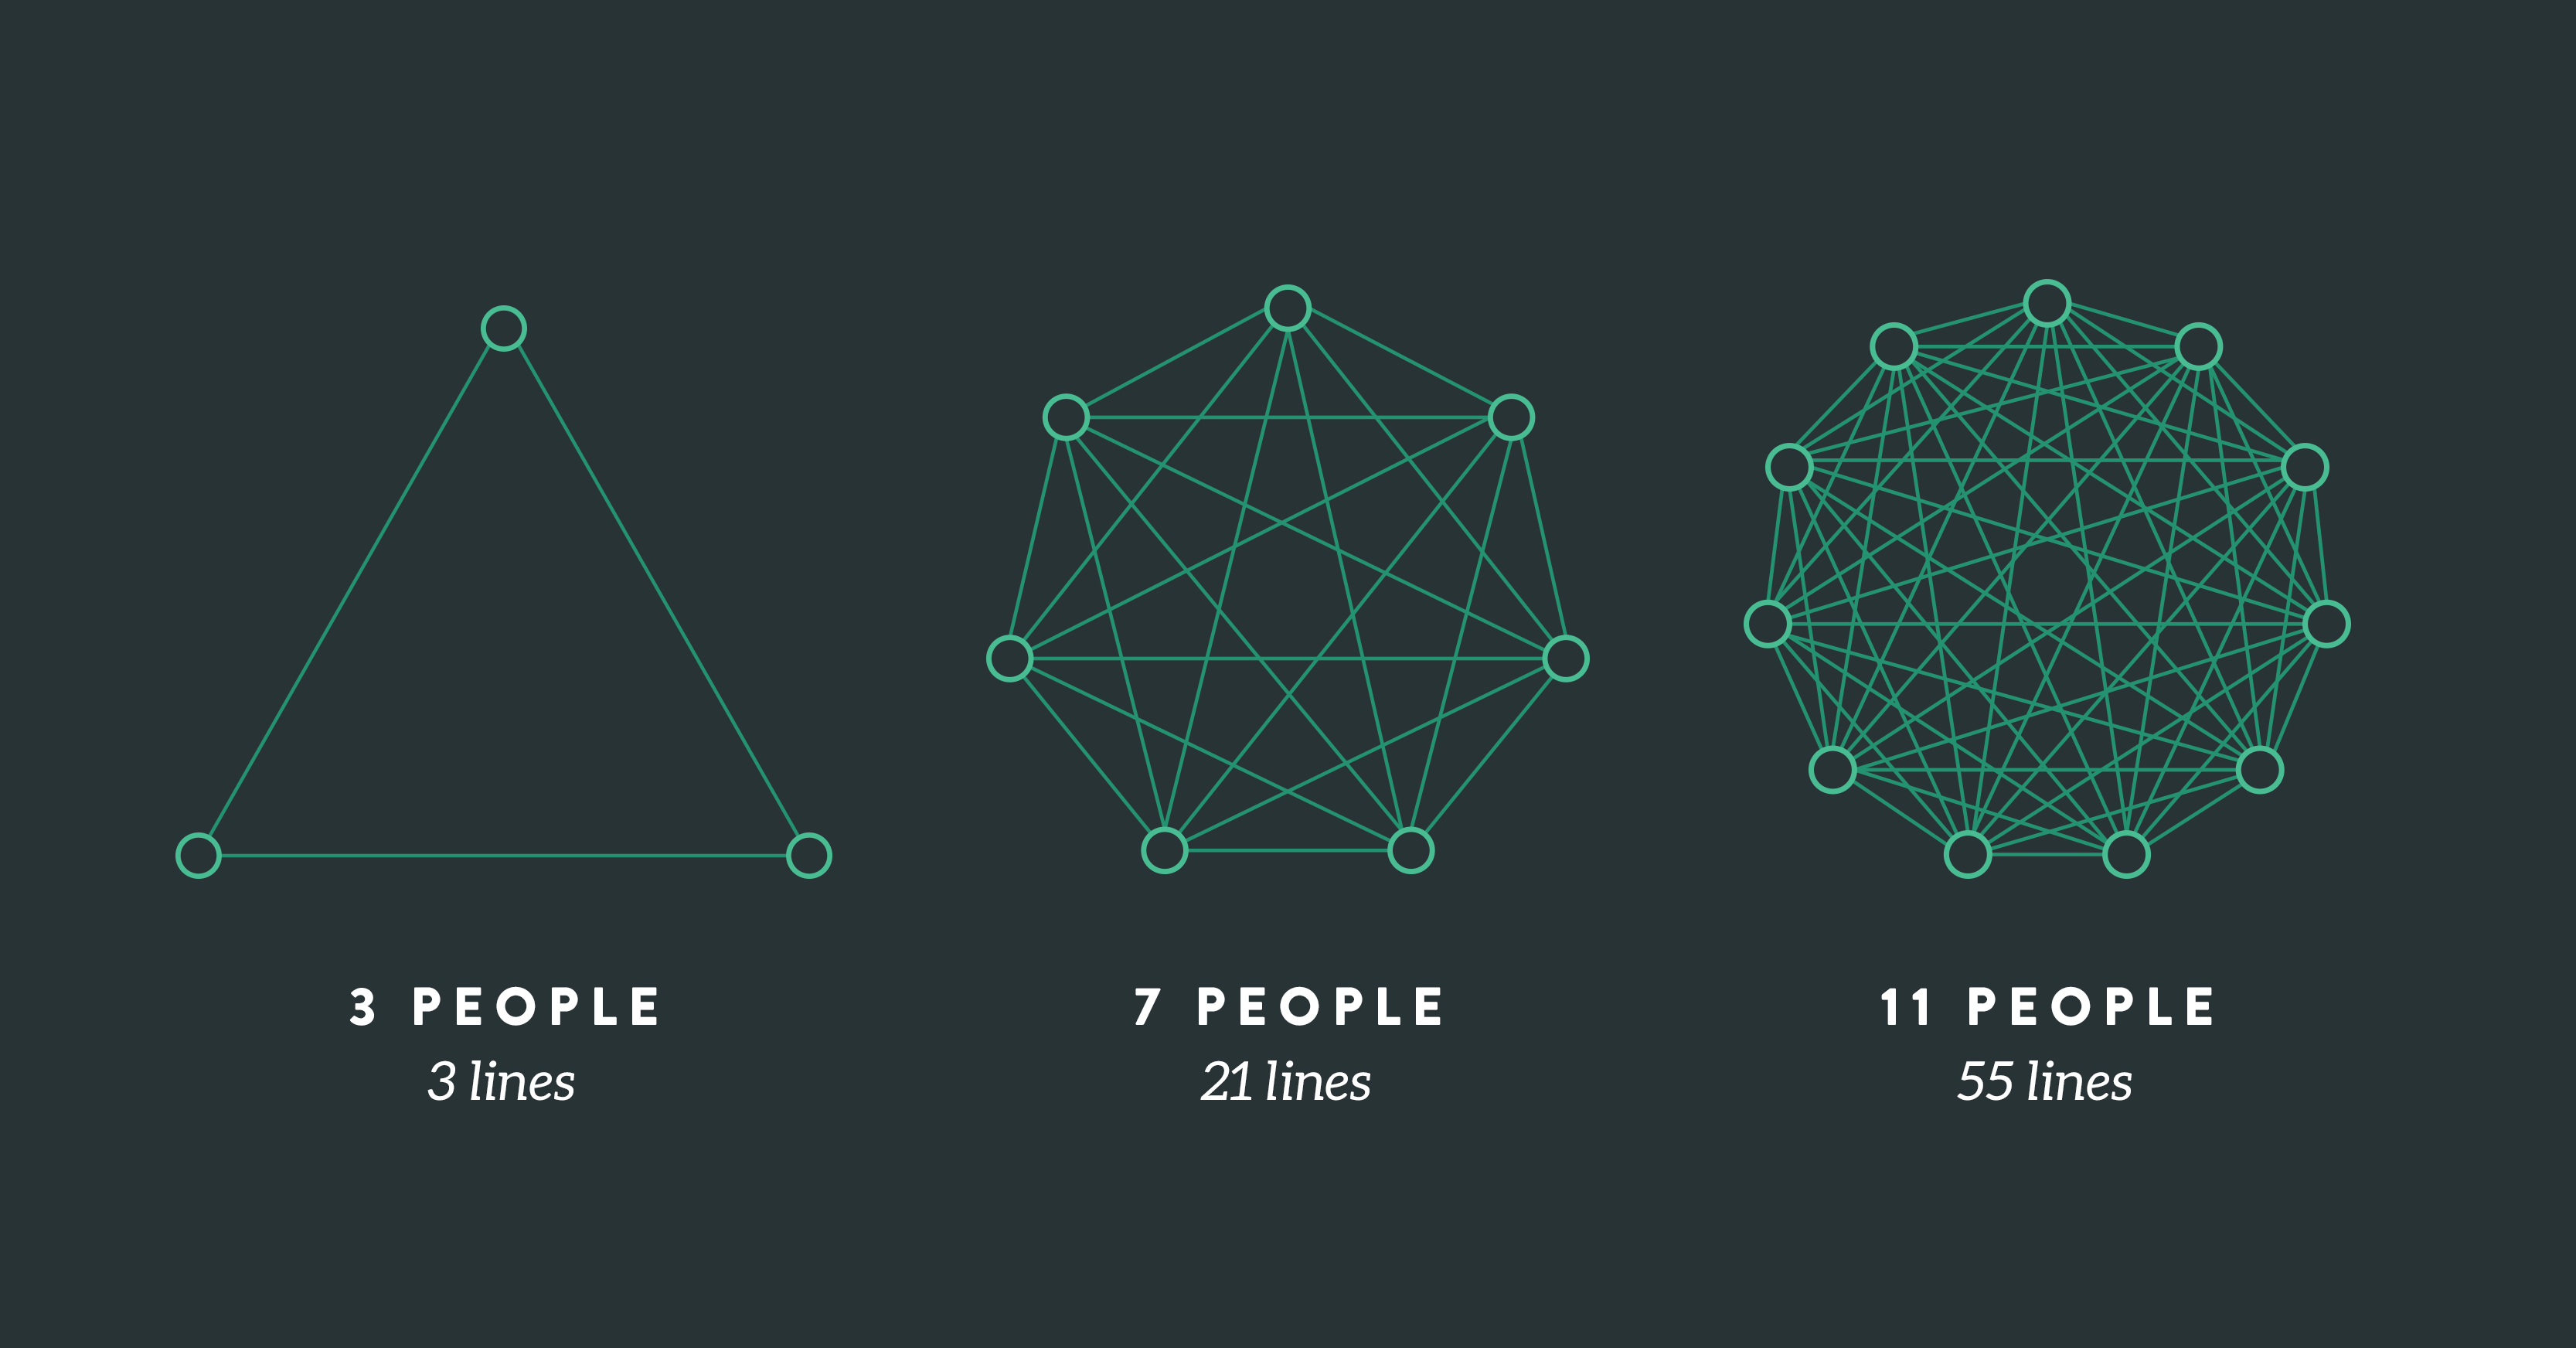 Lines of communication illustration